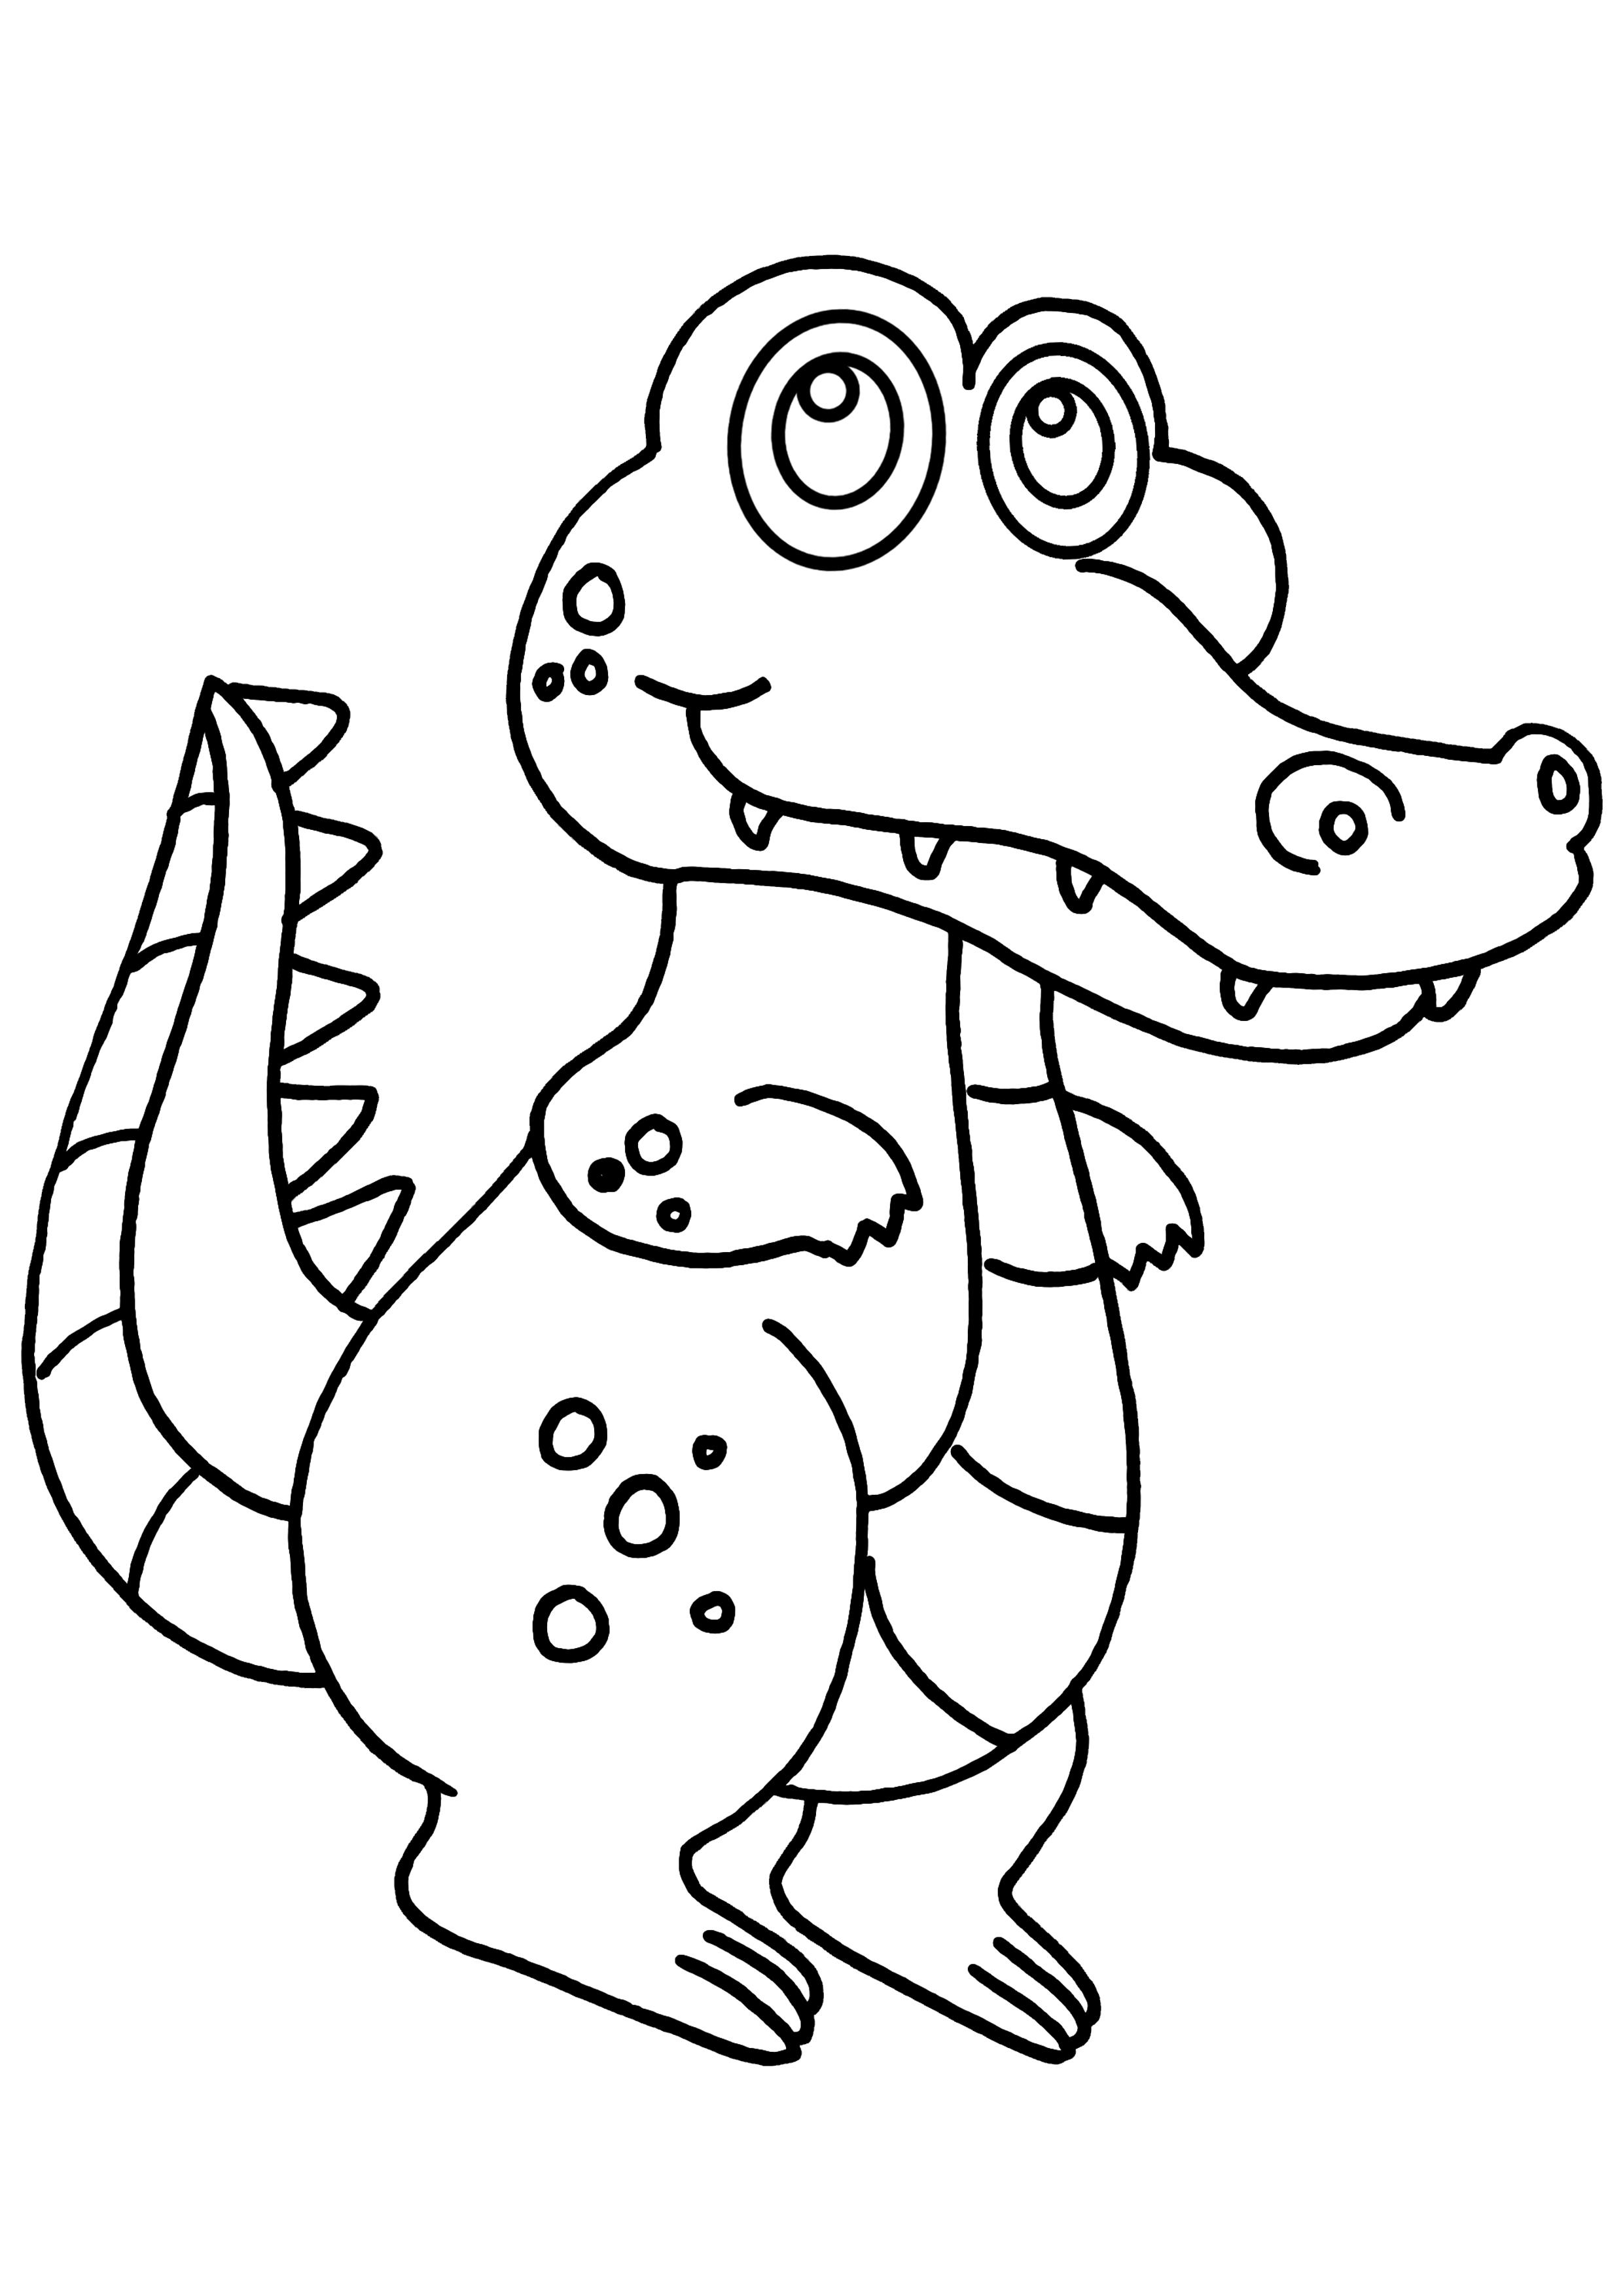 Coloriage Animaux Crocodile.Coloriage Un Crocodile